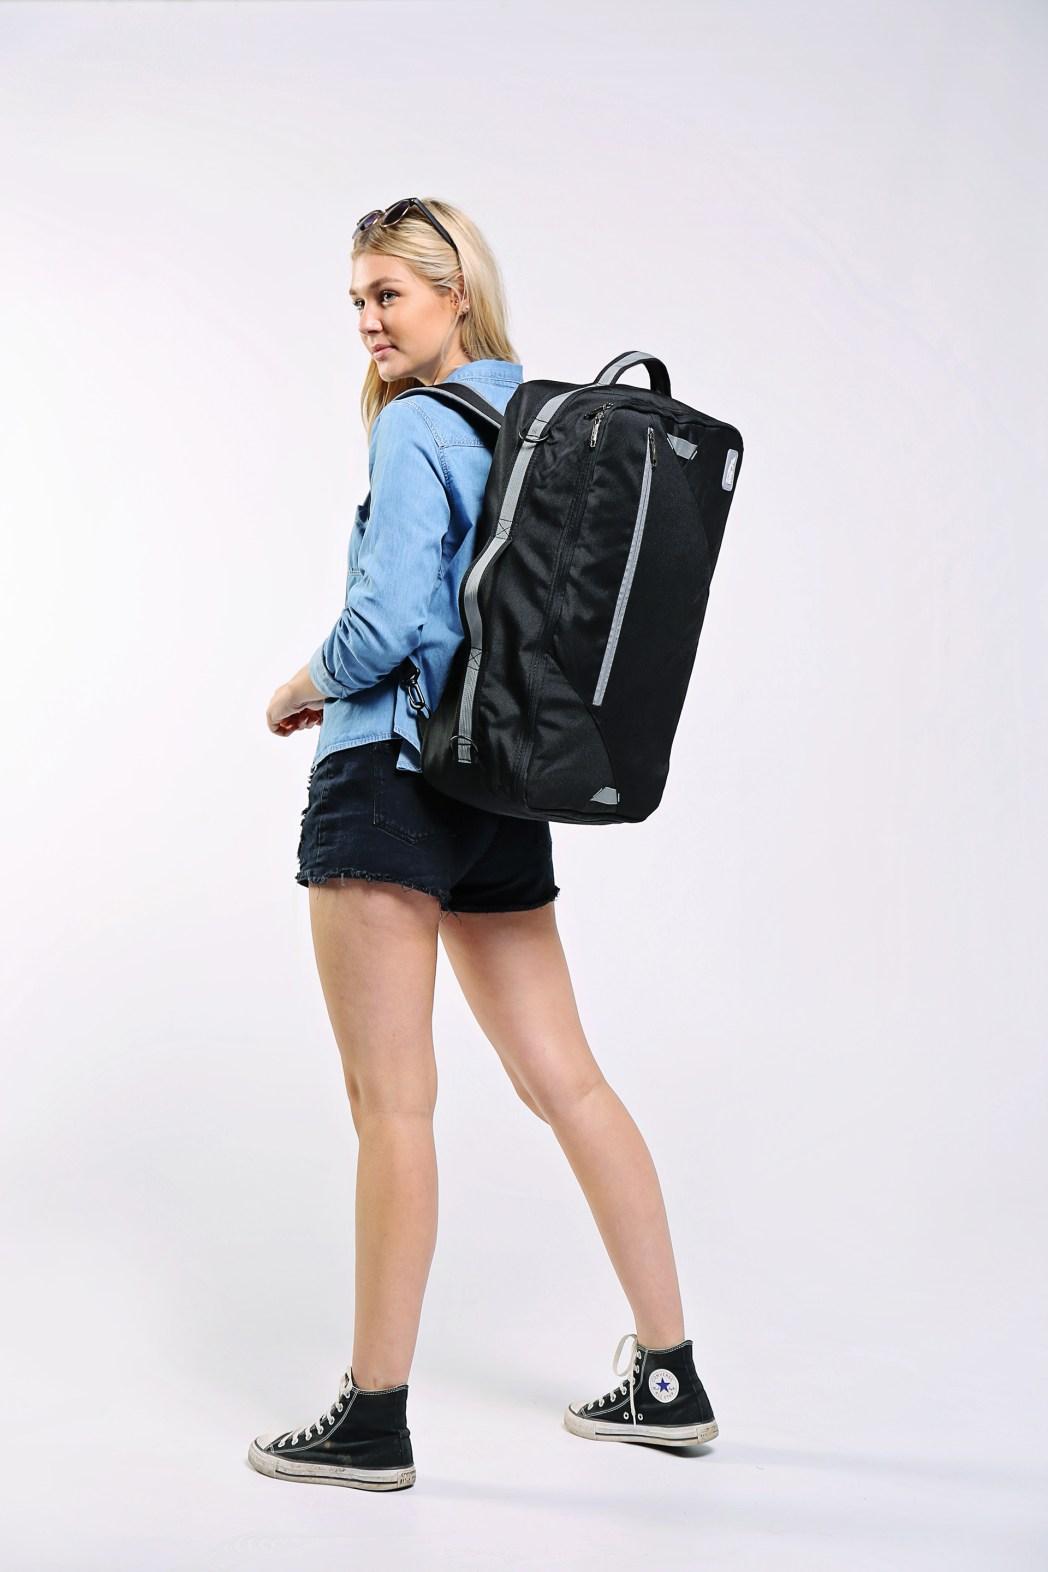 Woman modelling the Bergen backpack